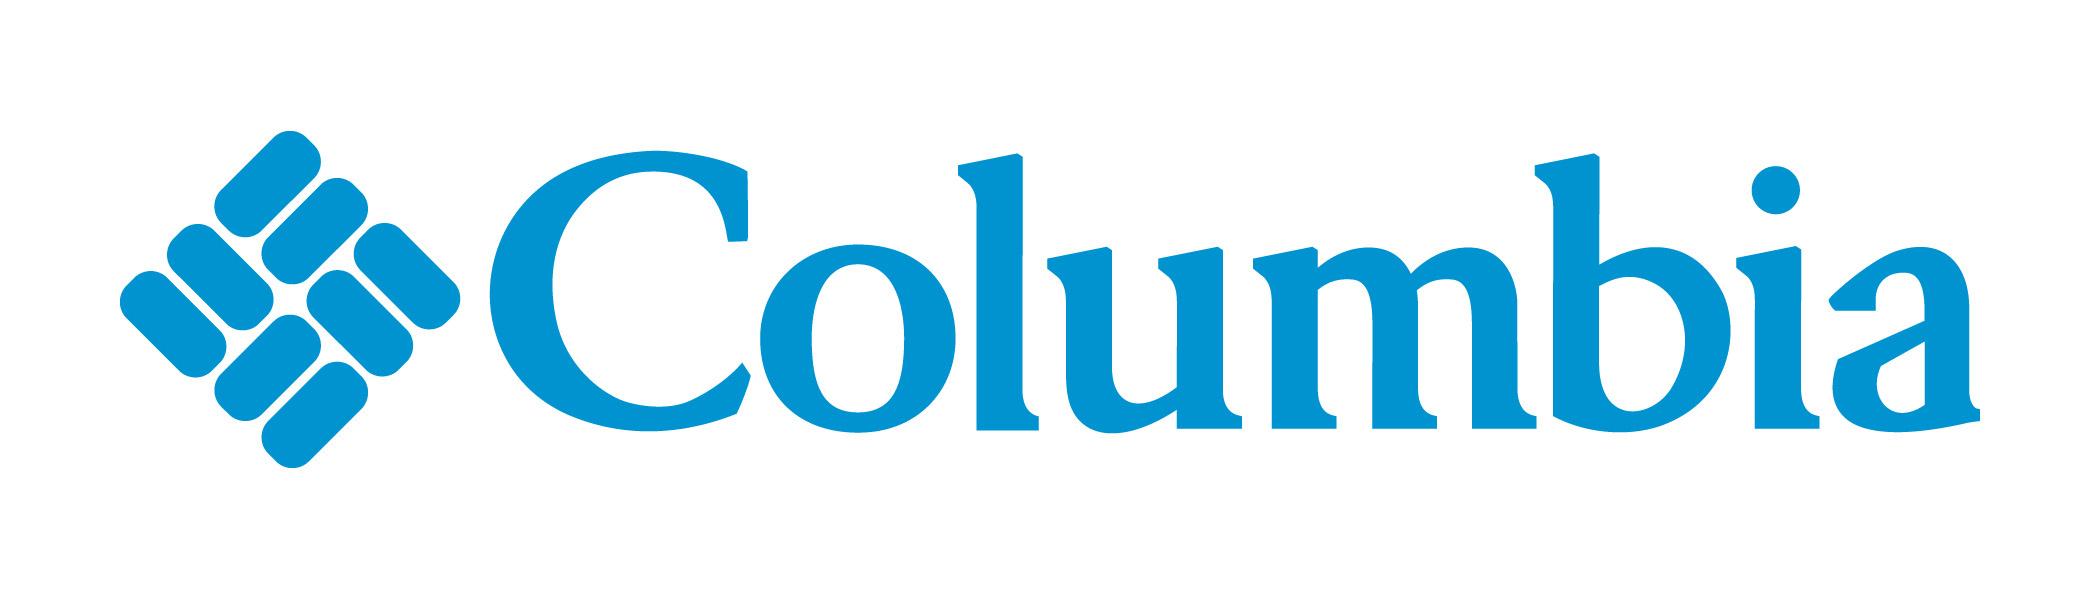 https://0901.nccdn.net/4_2/000/000/000/777/columbia-logo-2100x600.jpg